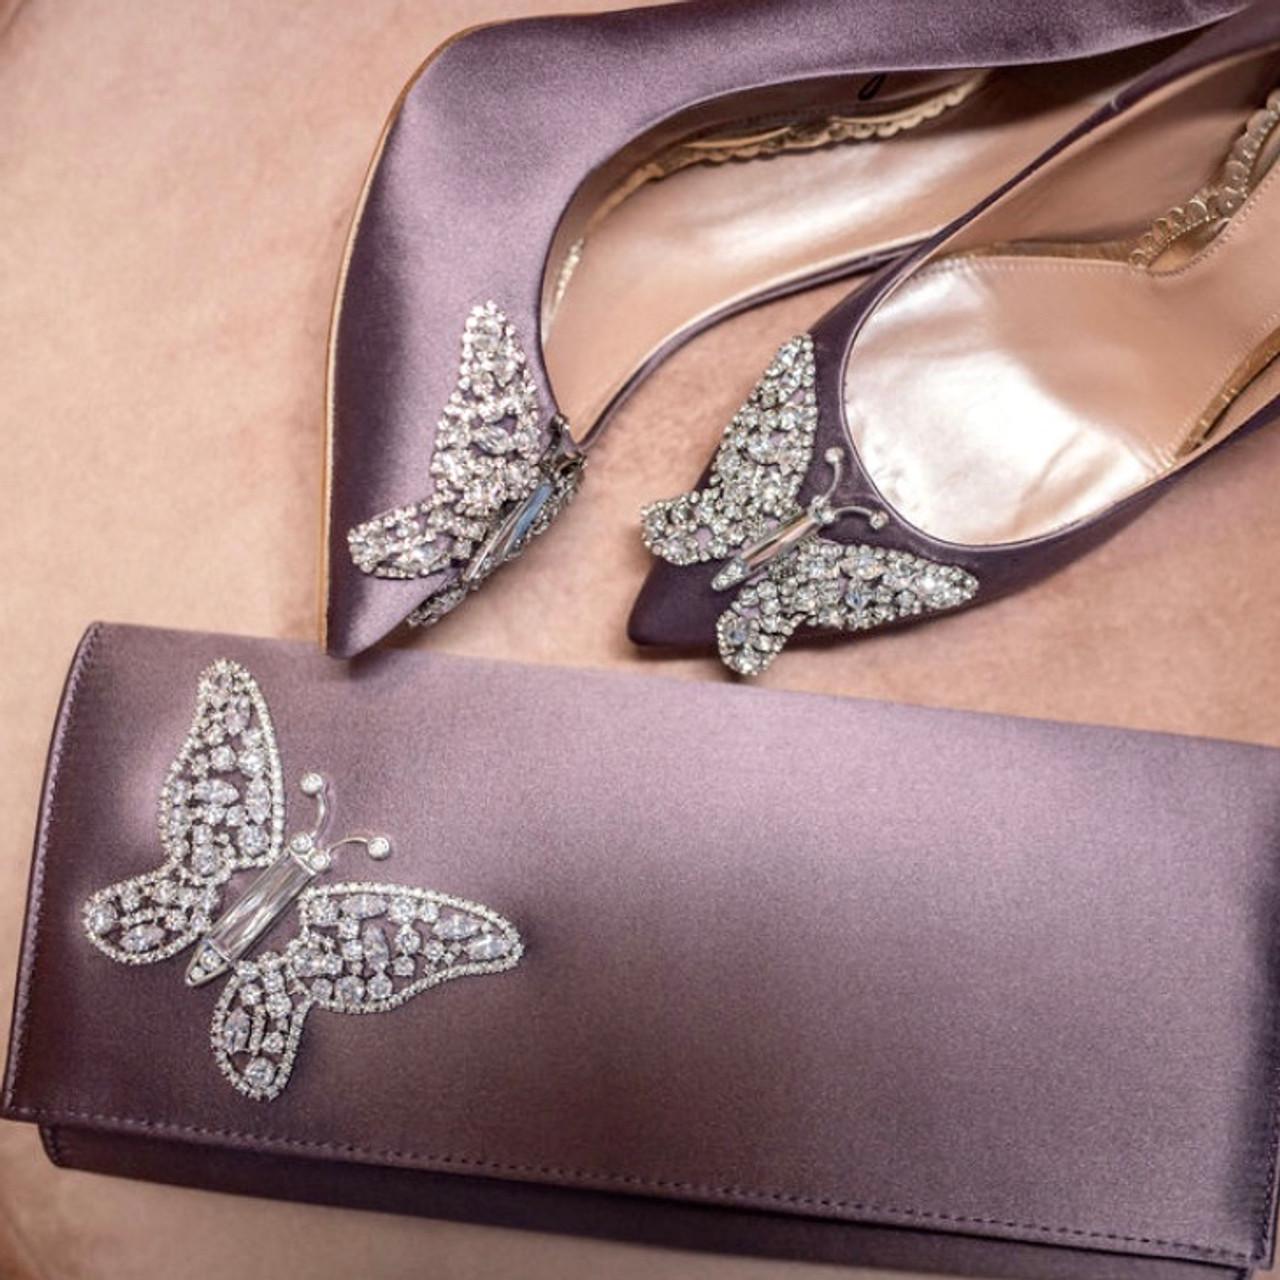 Farfalla Lilac Satin Clutch Bag